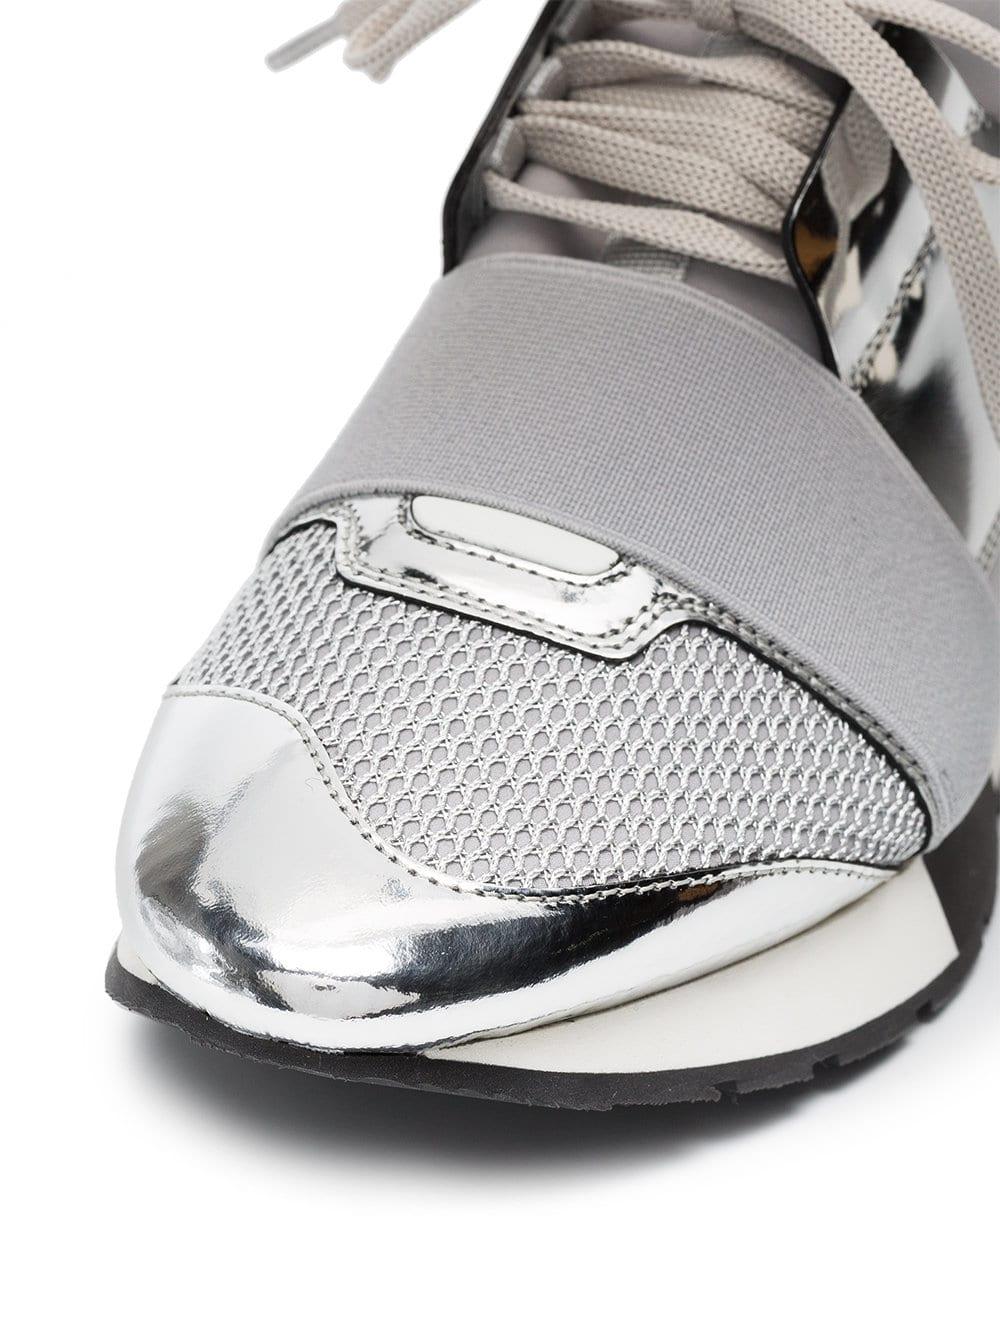 Dames Adidas Originals Superstar 80s DB2152 Core BlackWit